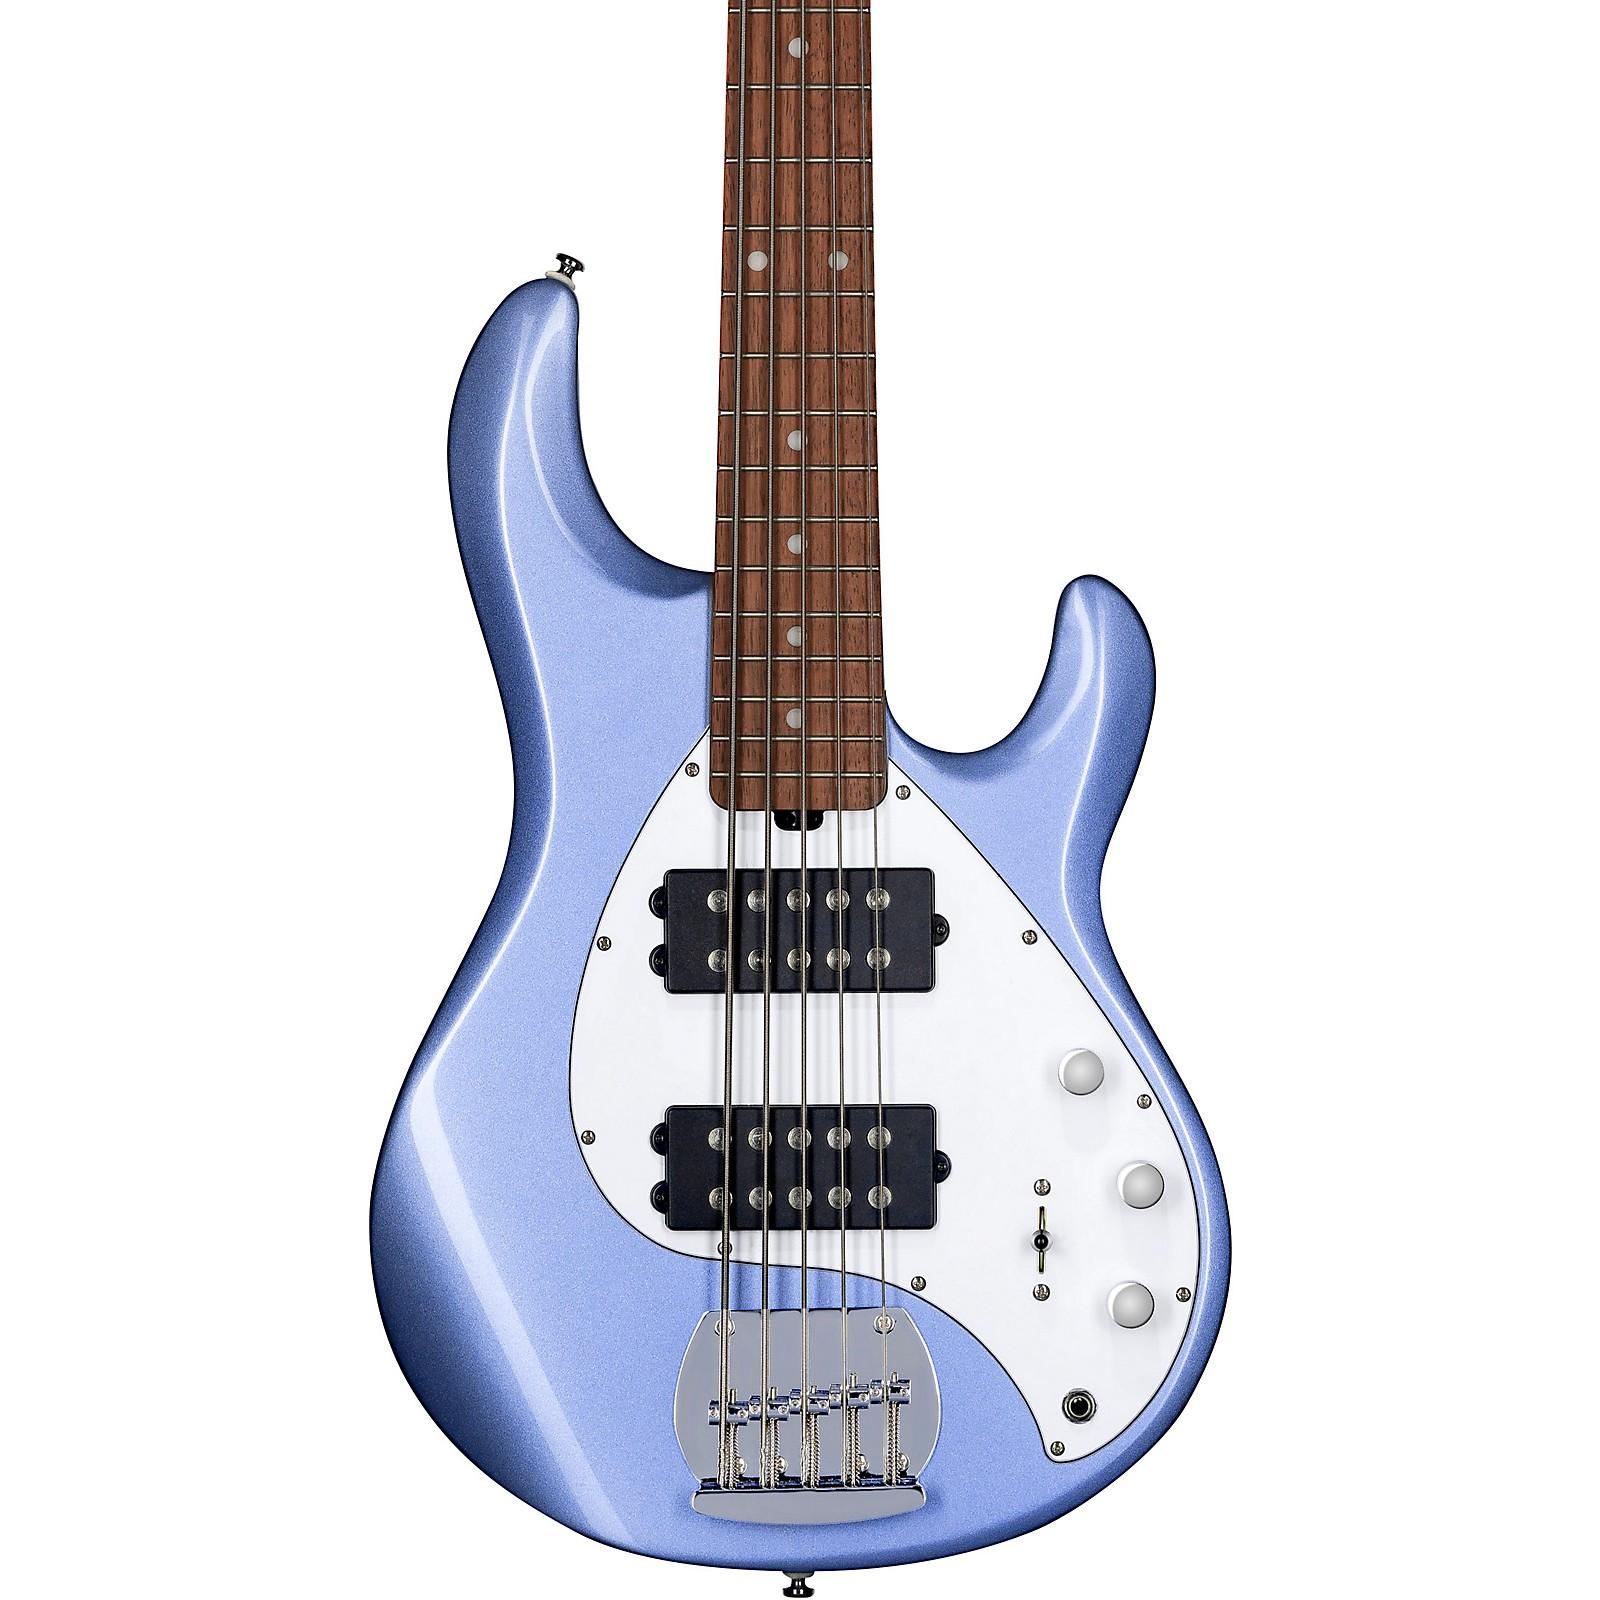 Sterling by Music Man S.U.B. StingRay 5 HH 5-String Electric Bass